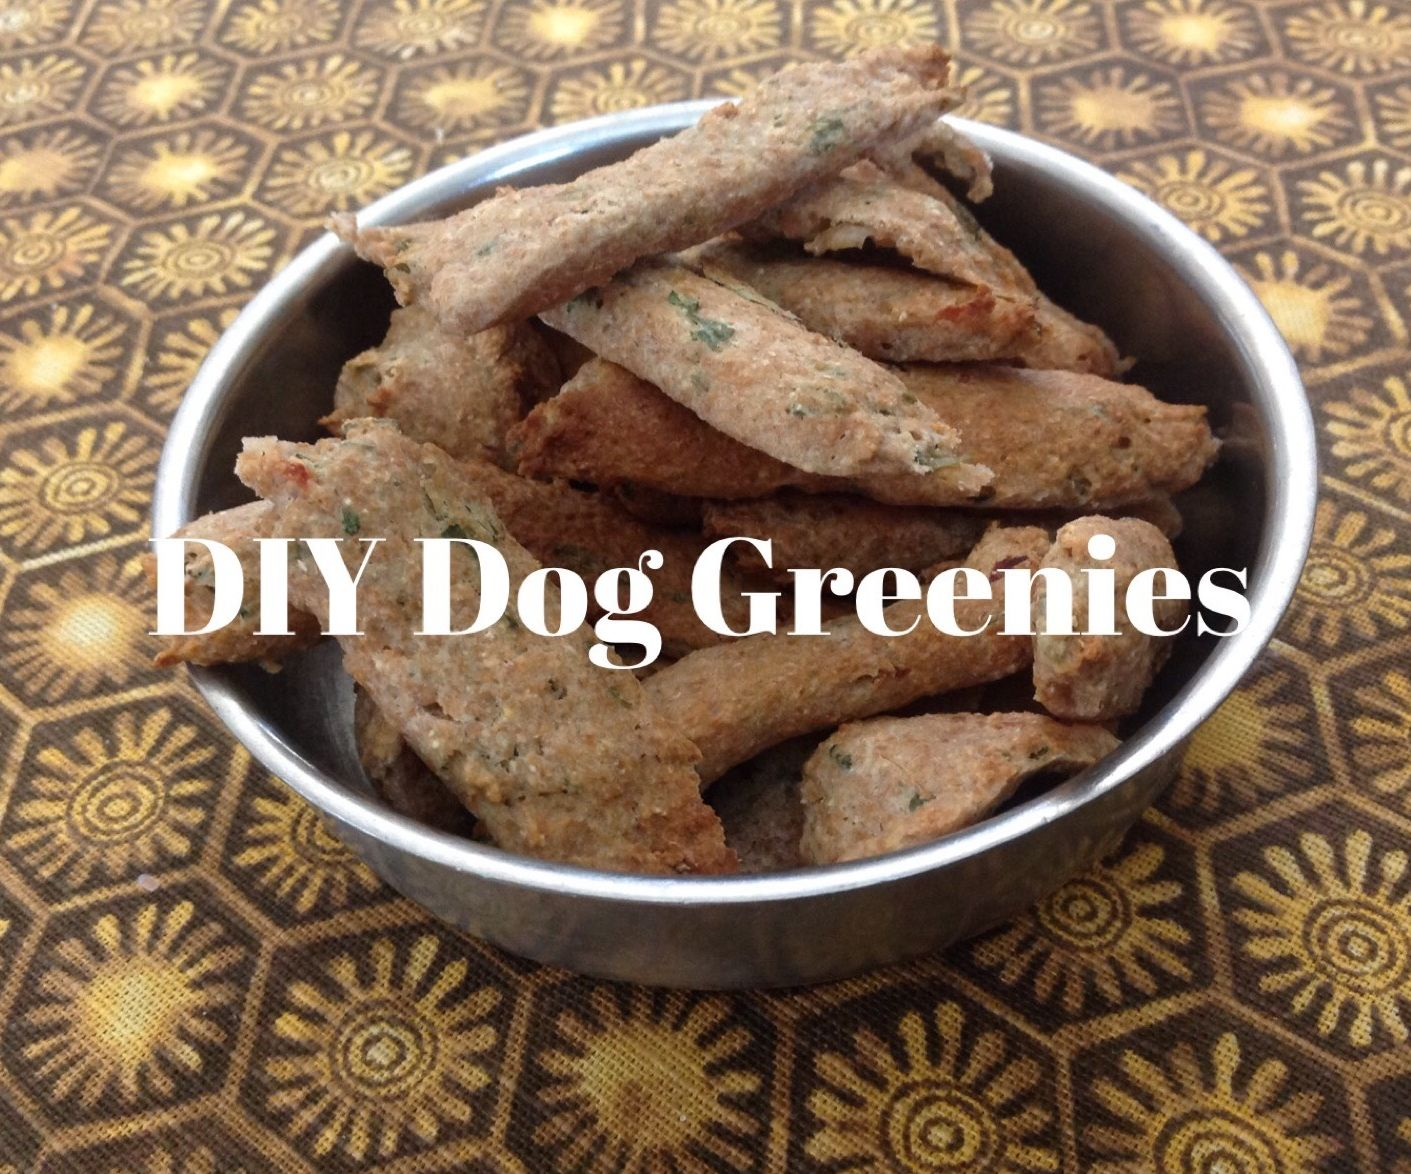 Homemade Dog Greenies For Fresh Breath And Clean Teeth